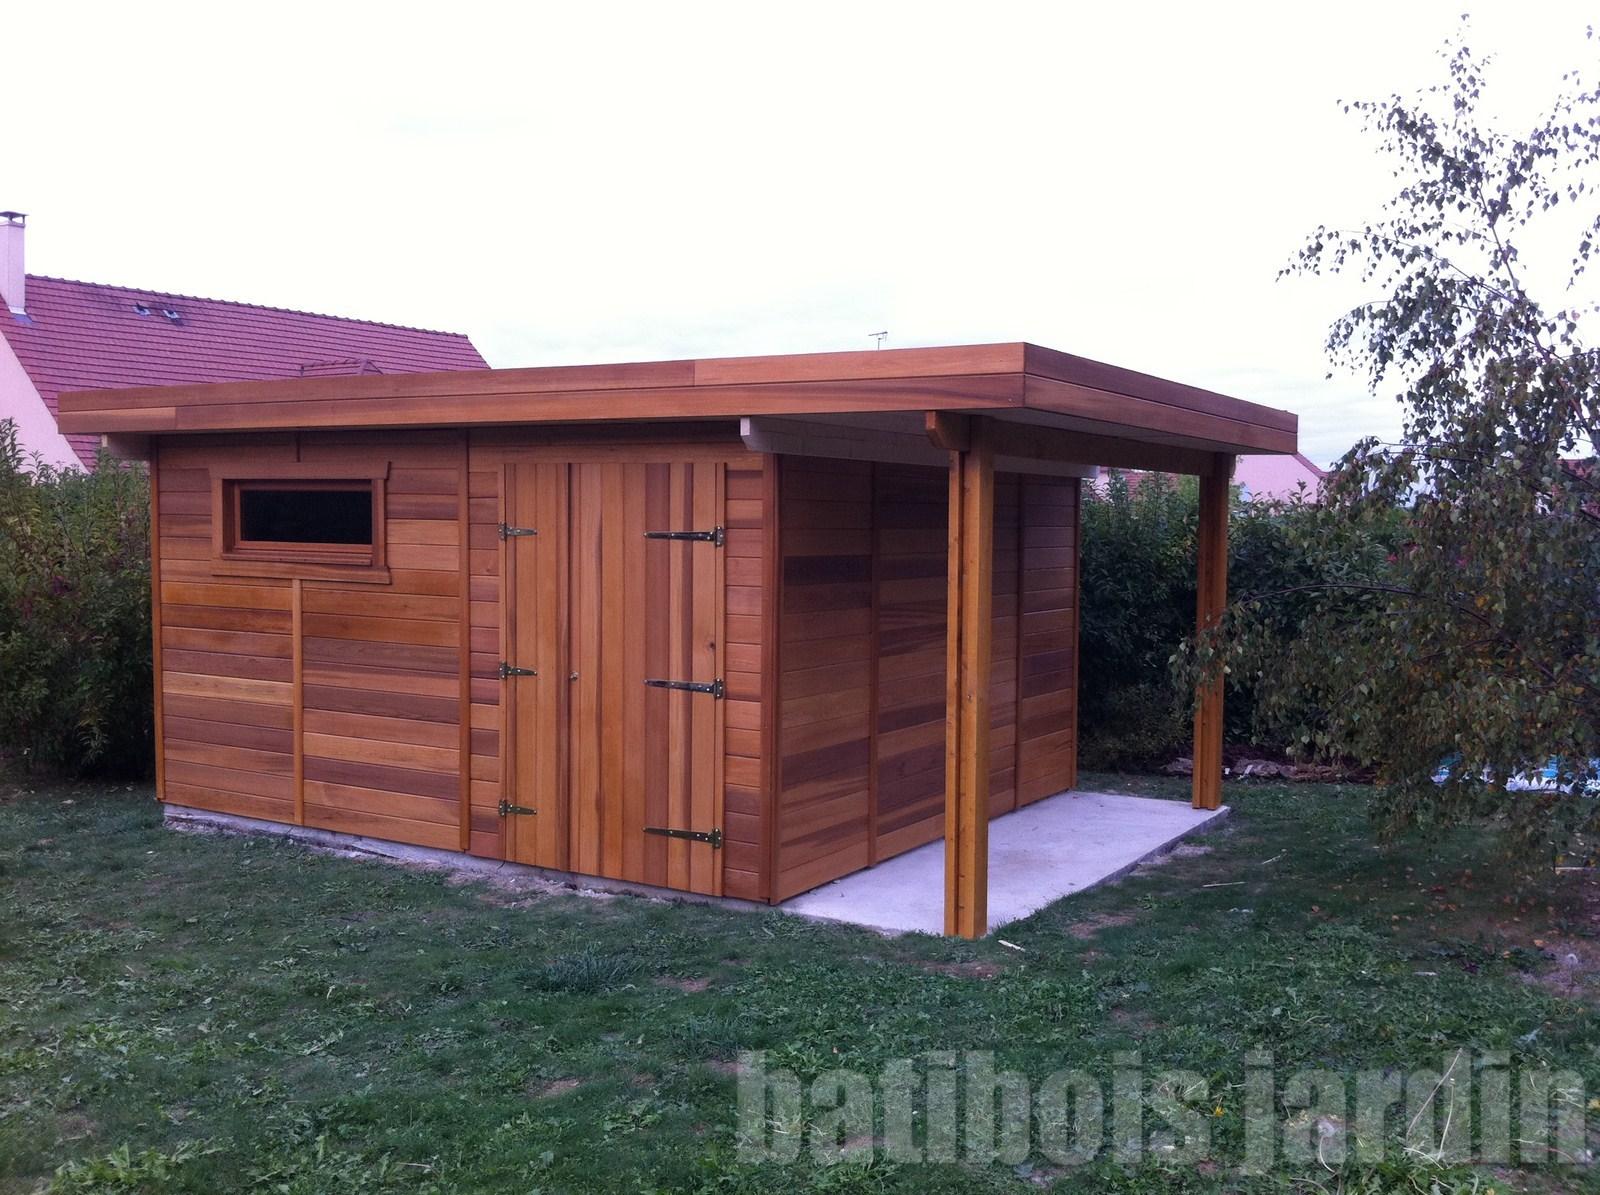 Beautiful abri de jardin toit plat avec bucher pictures for Abri de jardin toit plat avec auvent